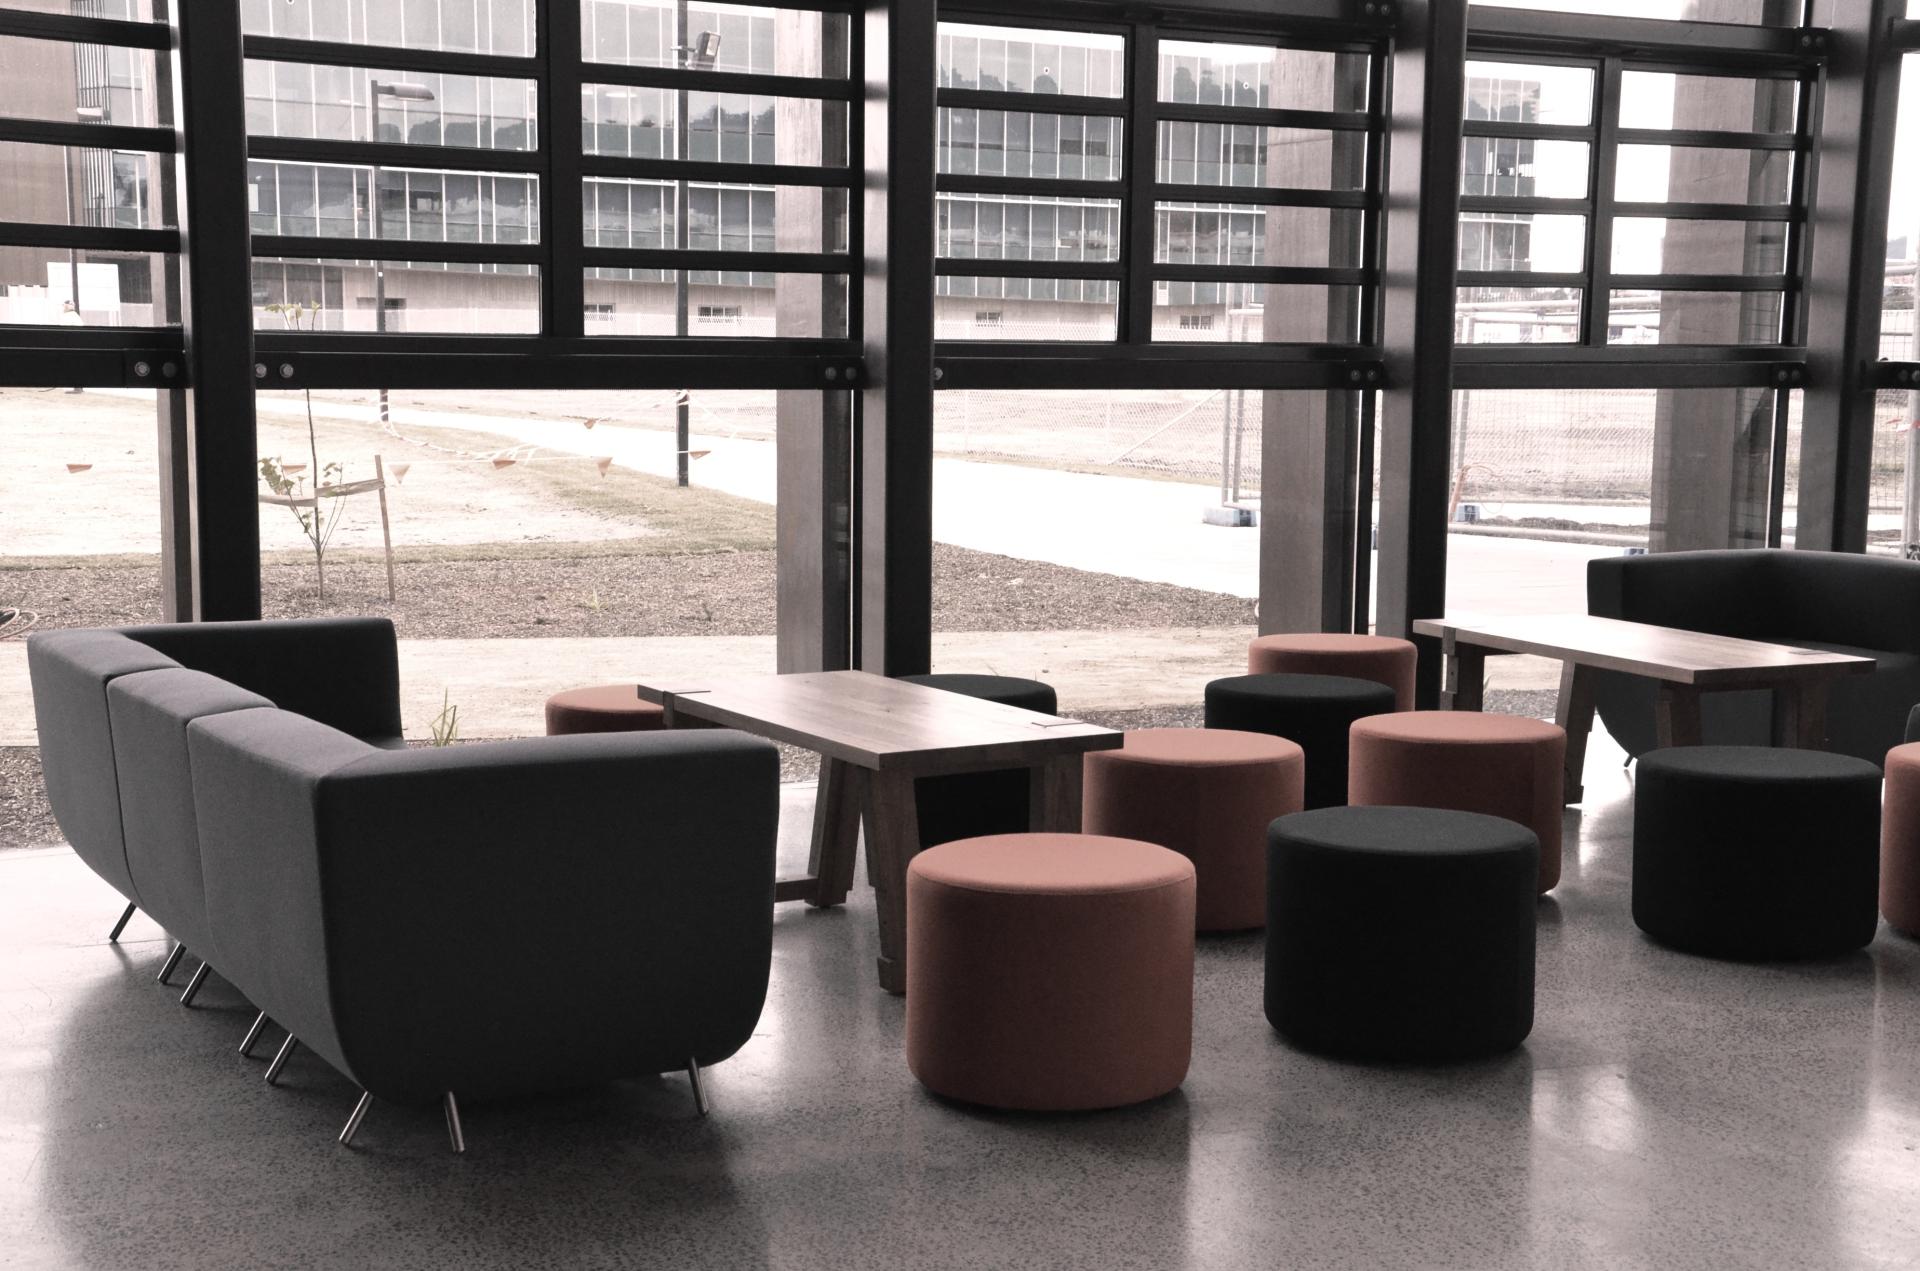 Direct Ergonomics | Sydney Office Furniture |Ergonomic Furniture |Collaborative Seating |Ergonomic Seating | Waiting Seating | Sit to Stand Desks | Ergonomic Workstations